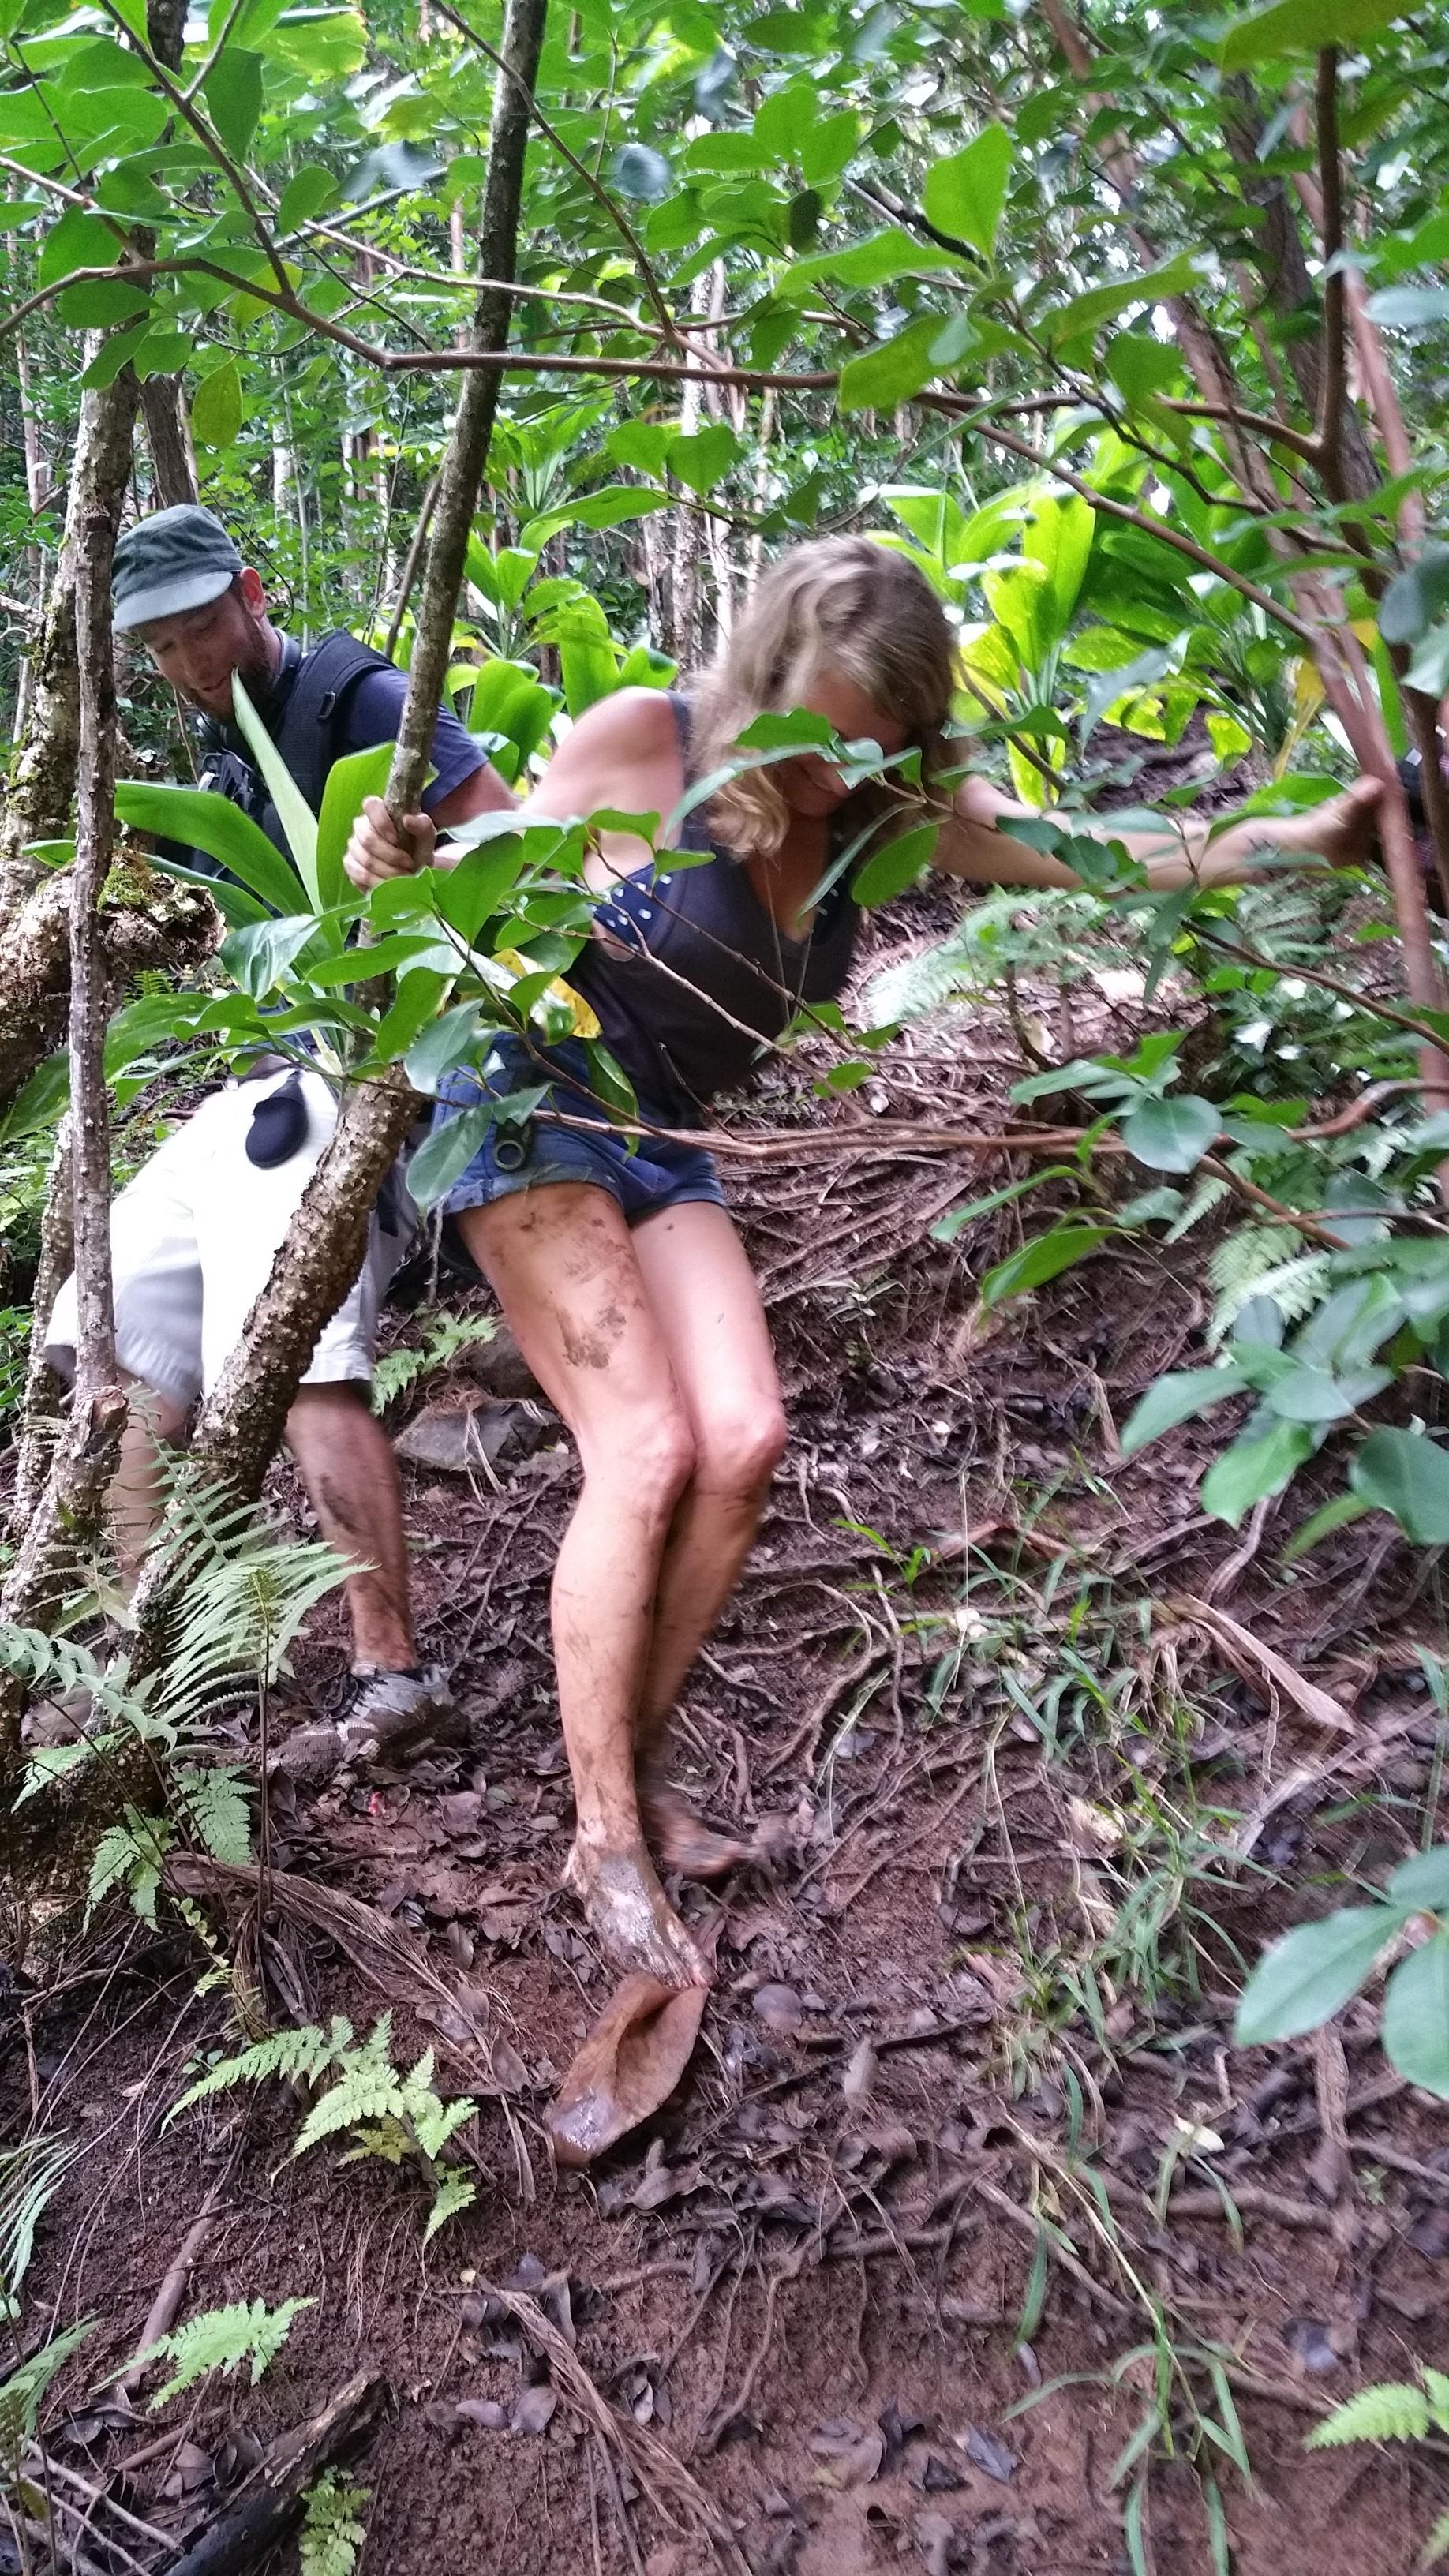 Kainoa captured my muddy feet